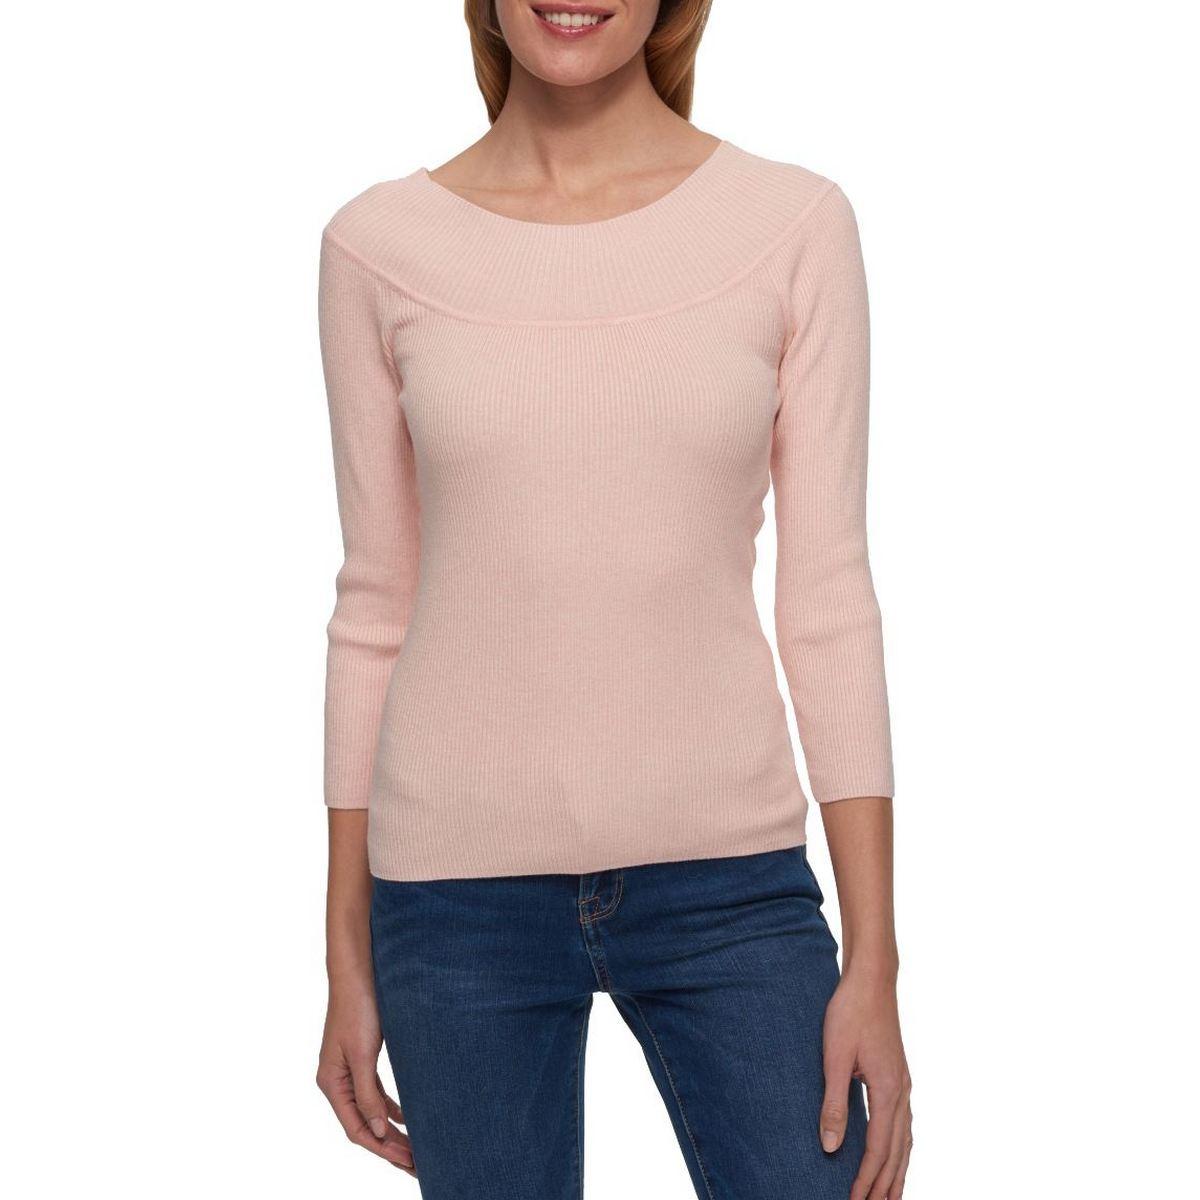 TOMMY HILFIGER NEW Women/'s Cotton Scoop-neck T-Shirt Top TEDO